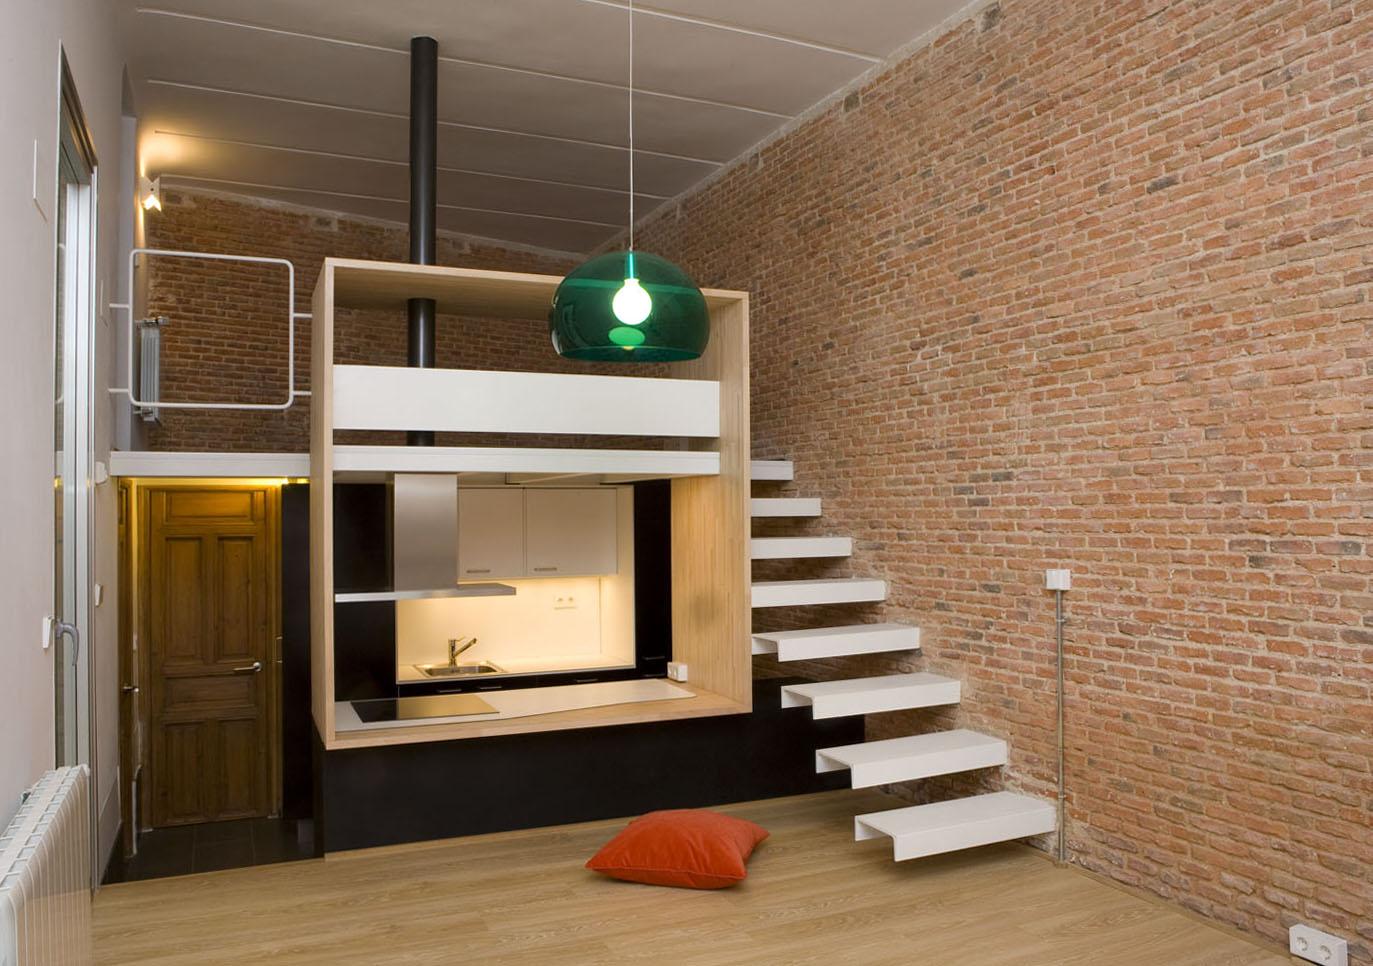 Loft Andrs Borrego Madrid Spain BeriotBernardini arquitectos